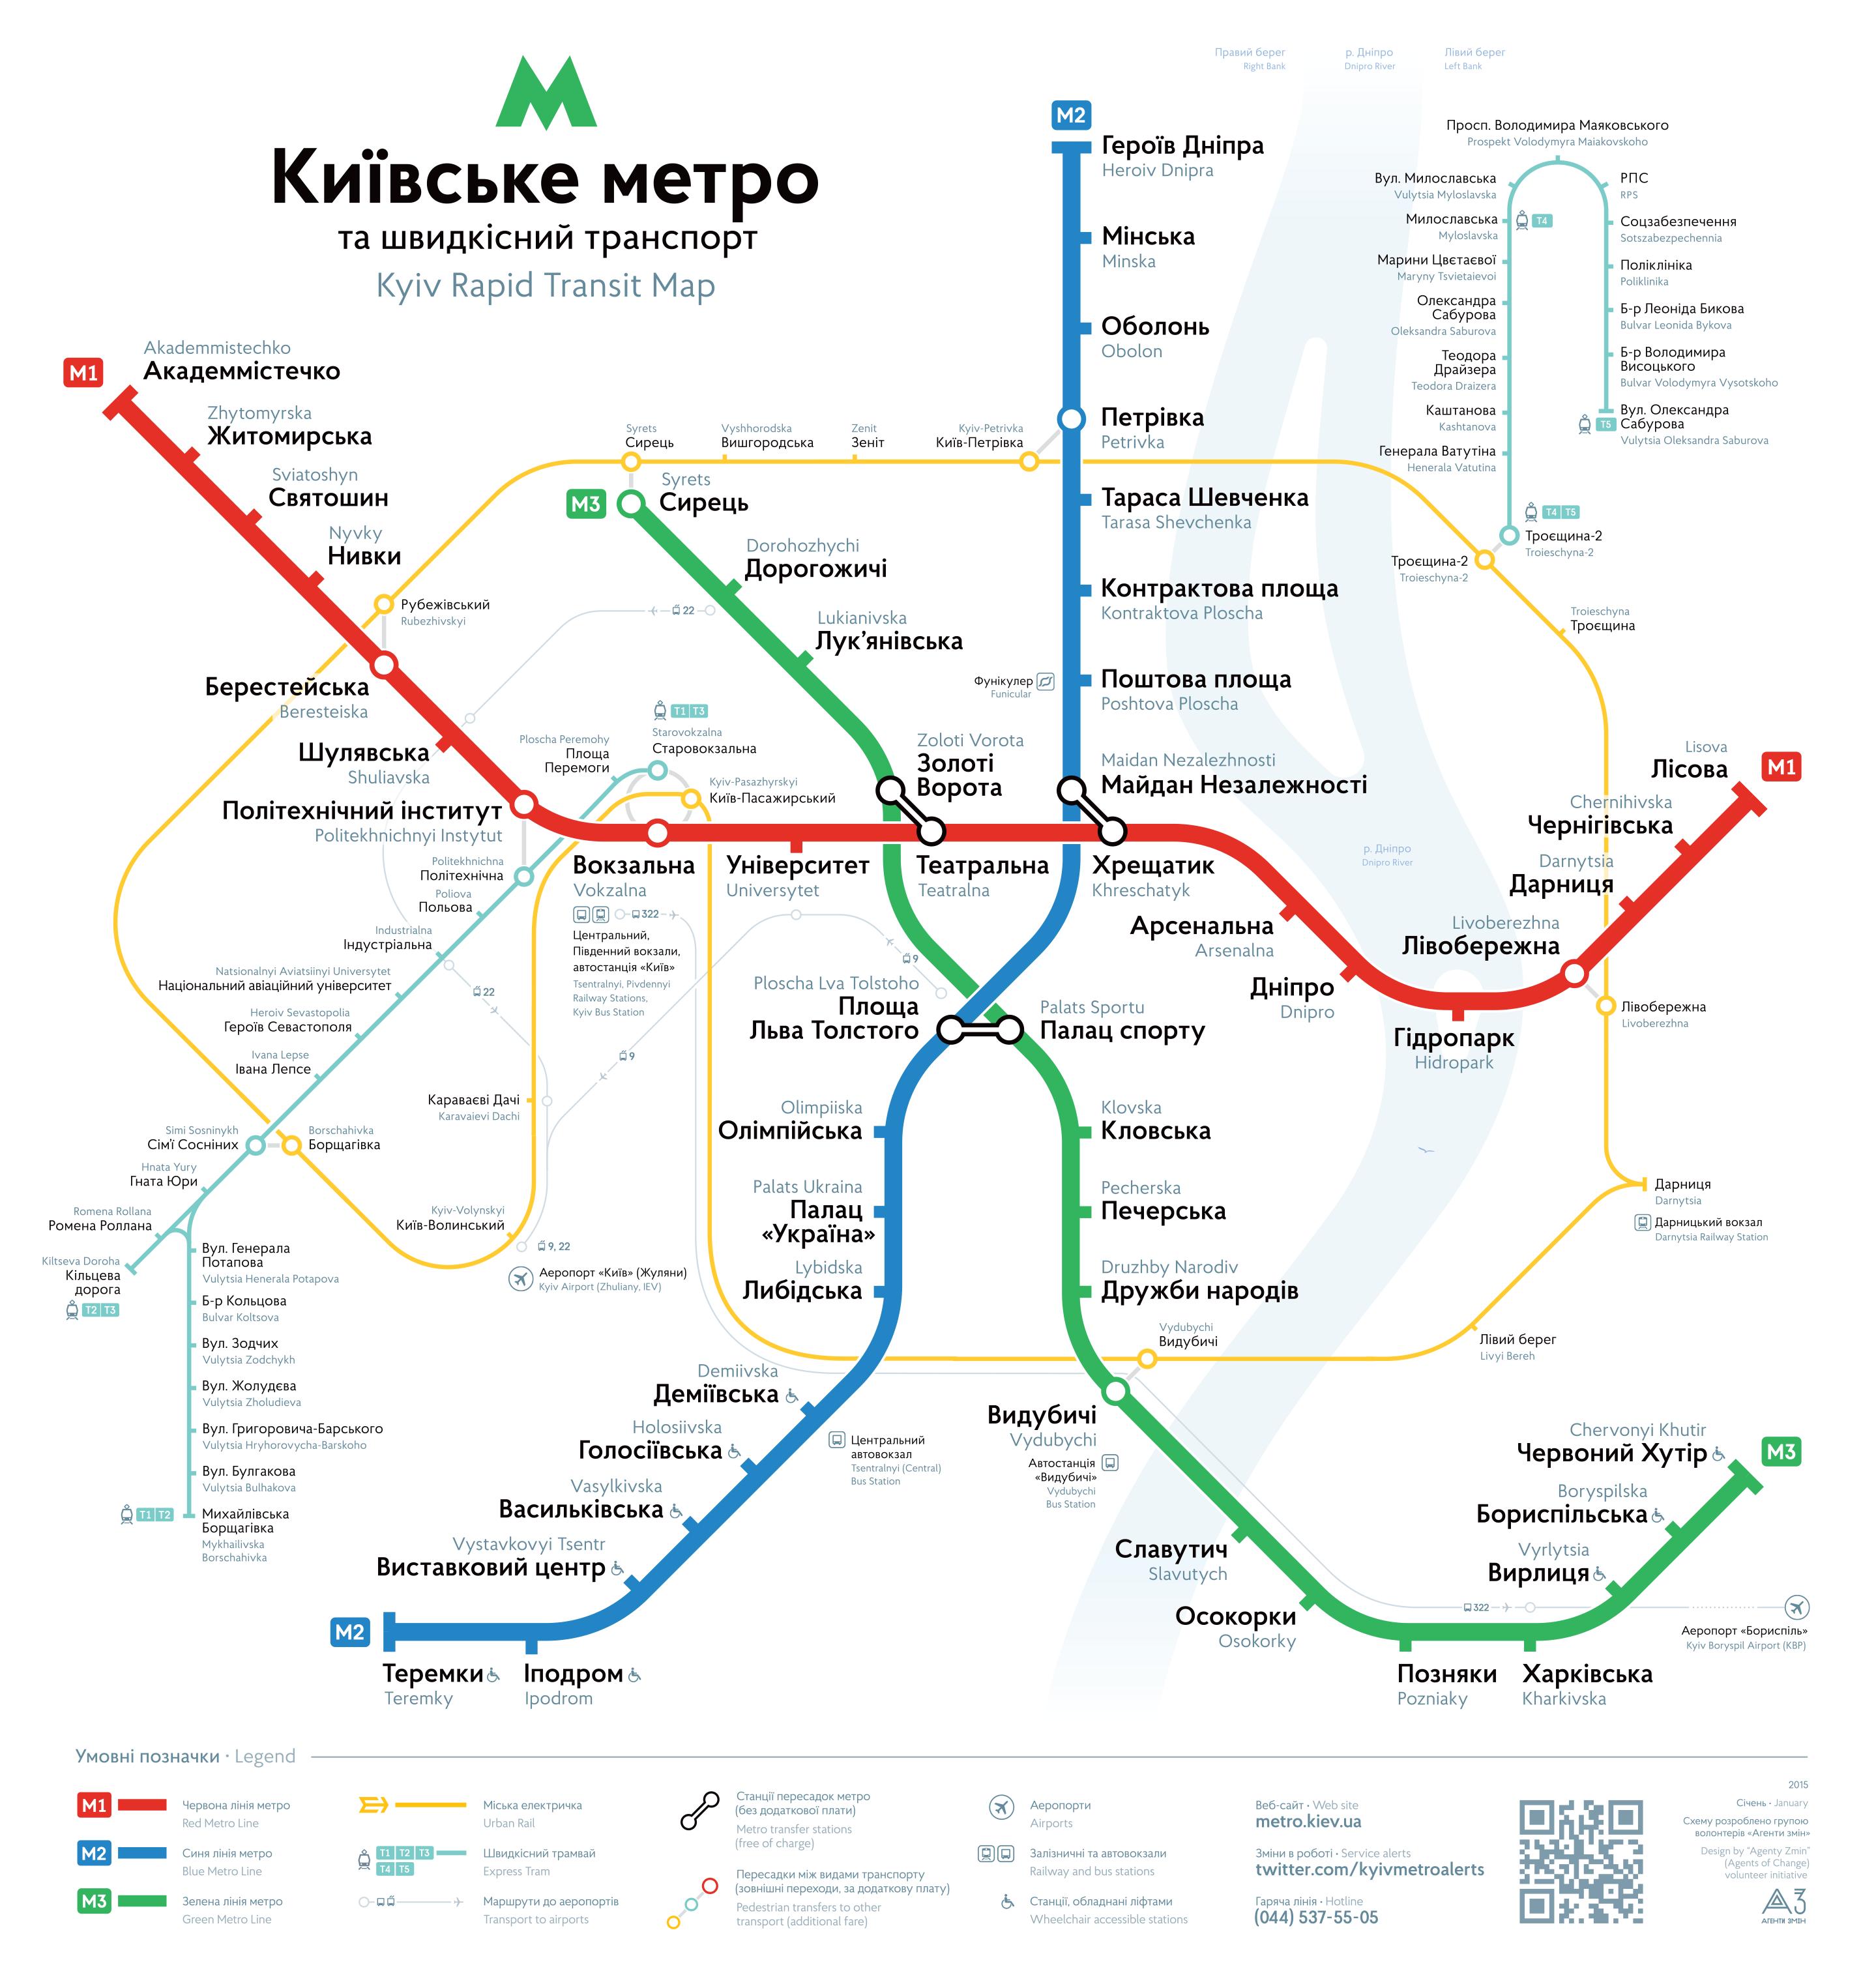 метро картинка схема